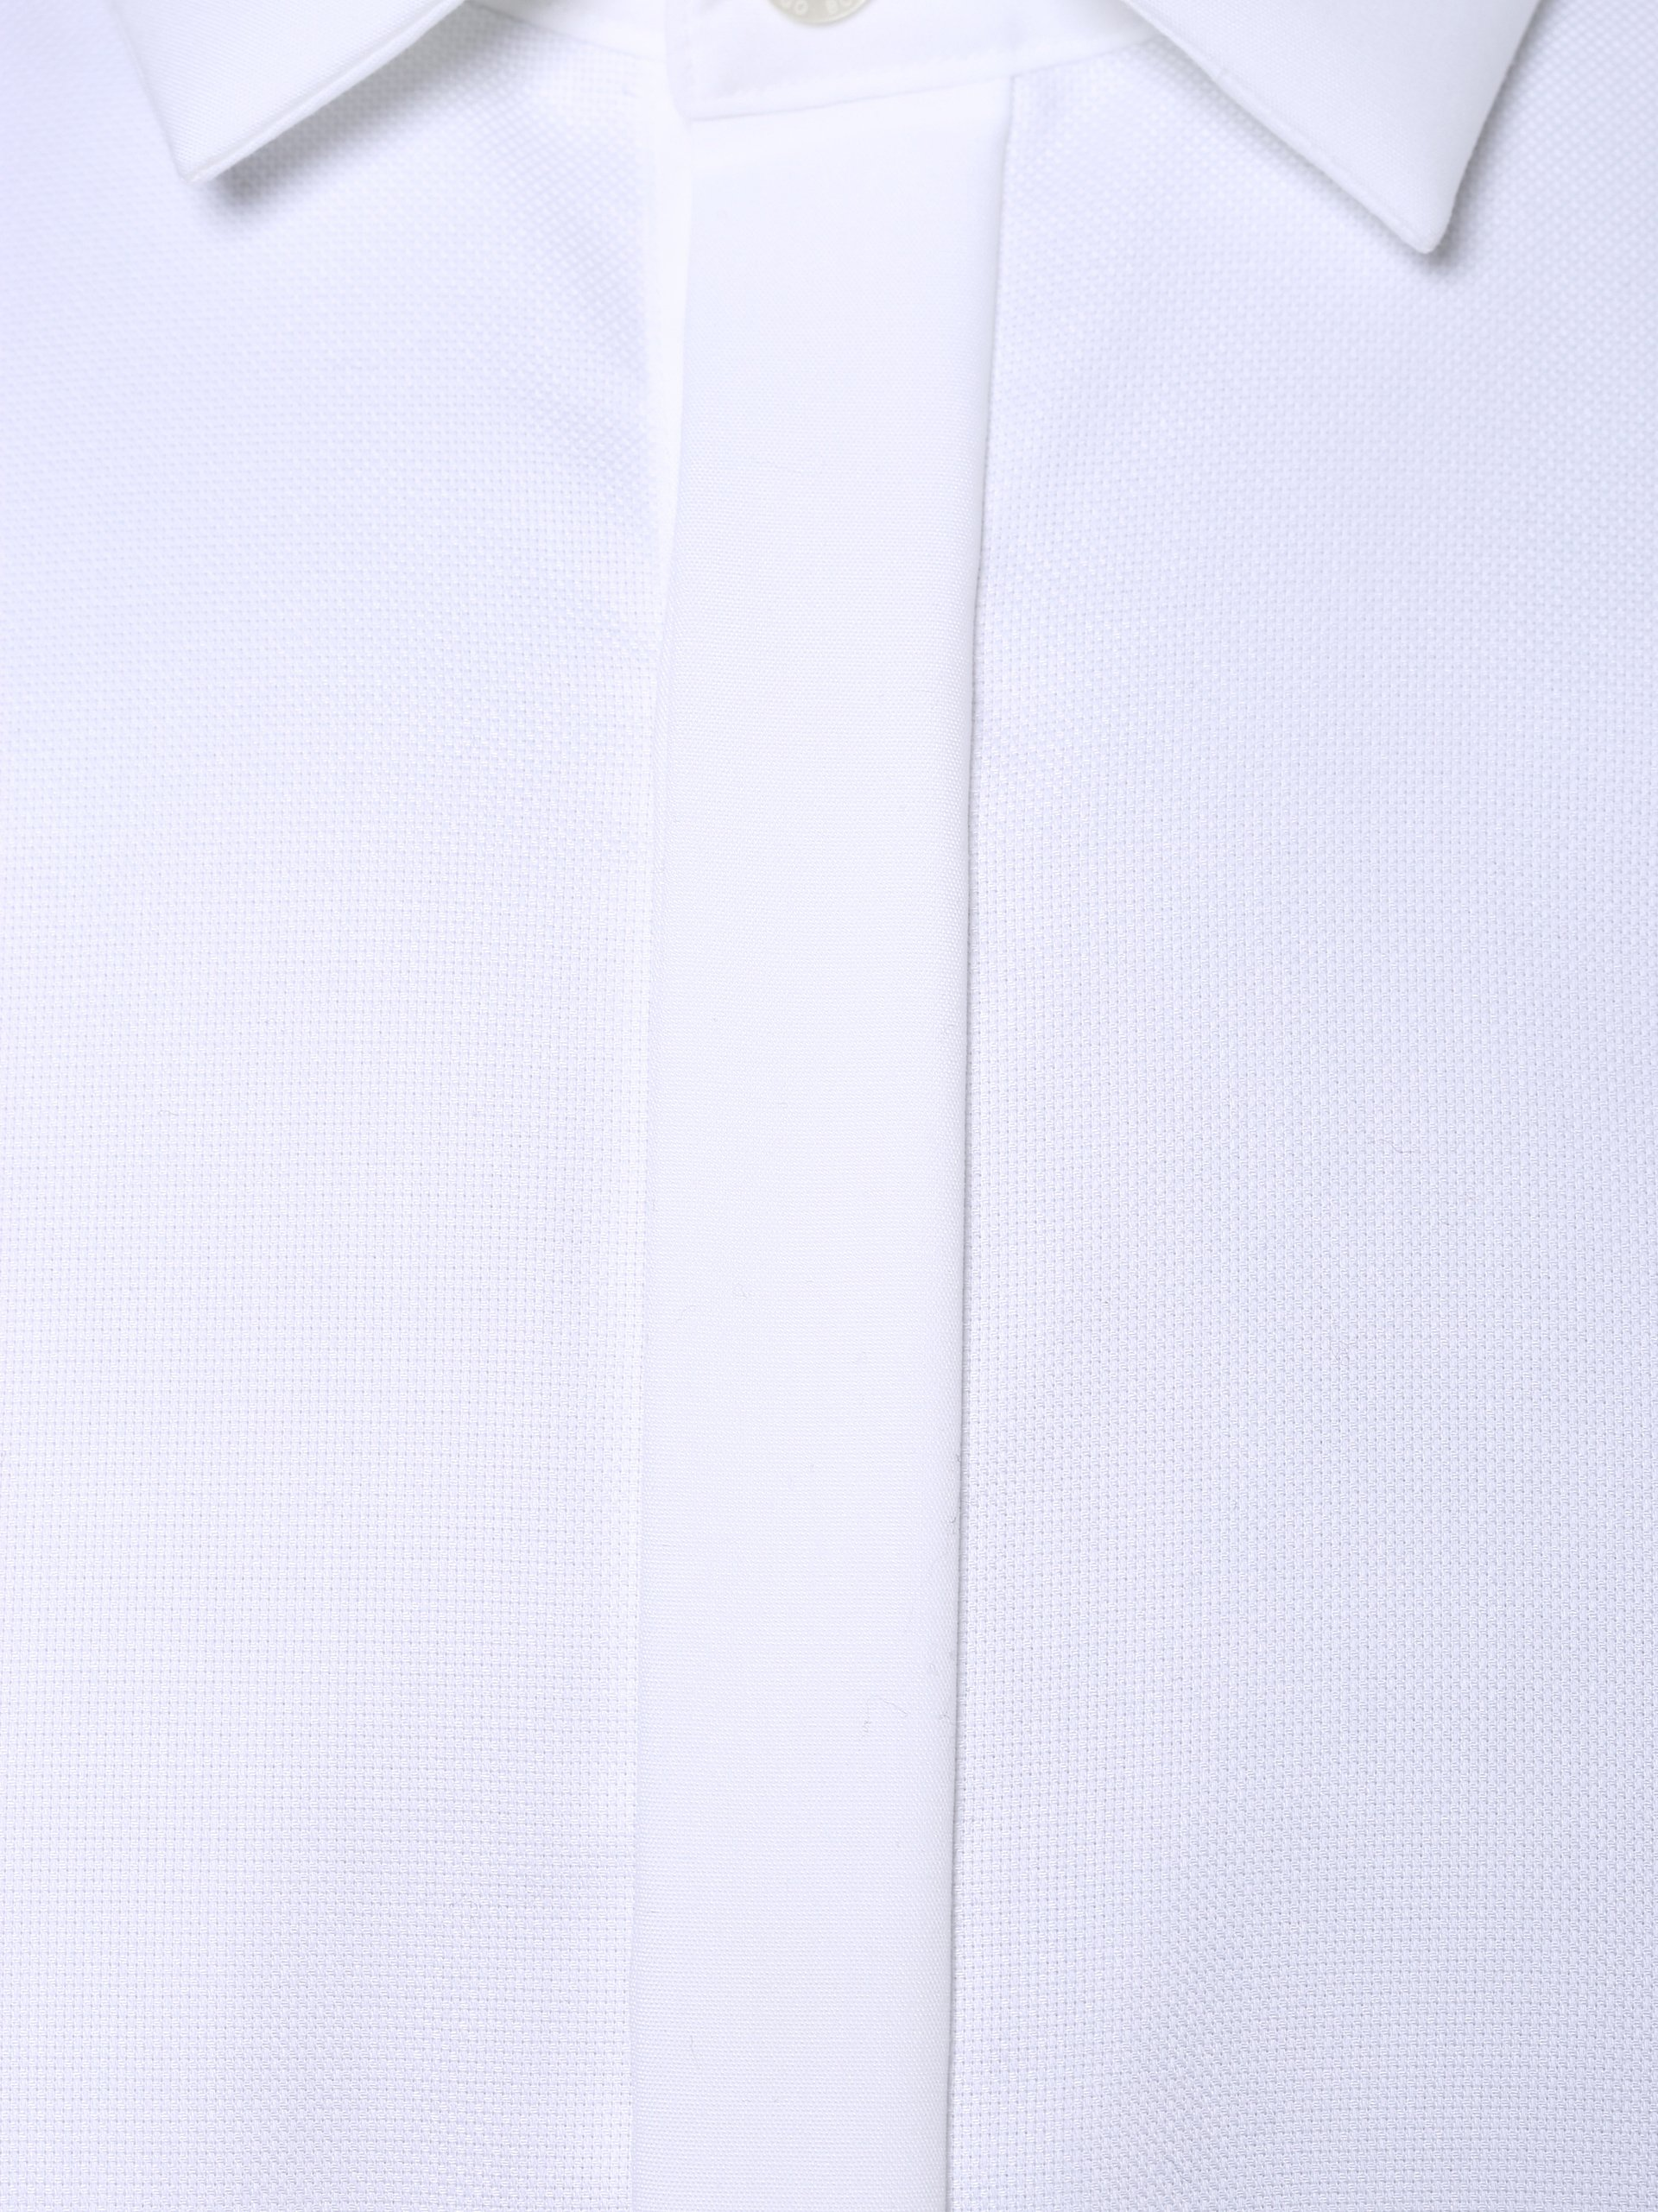 HUGO Herren Hemd Bügelleicht - Easto